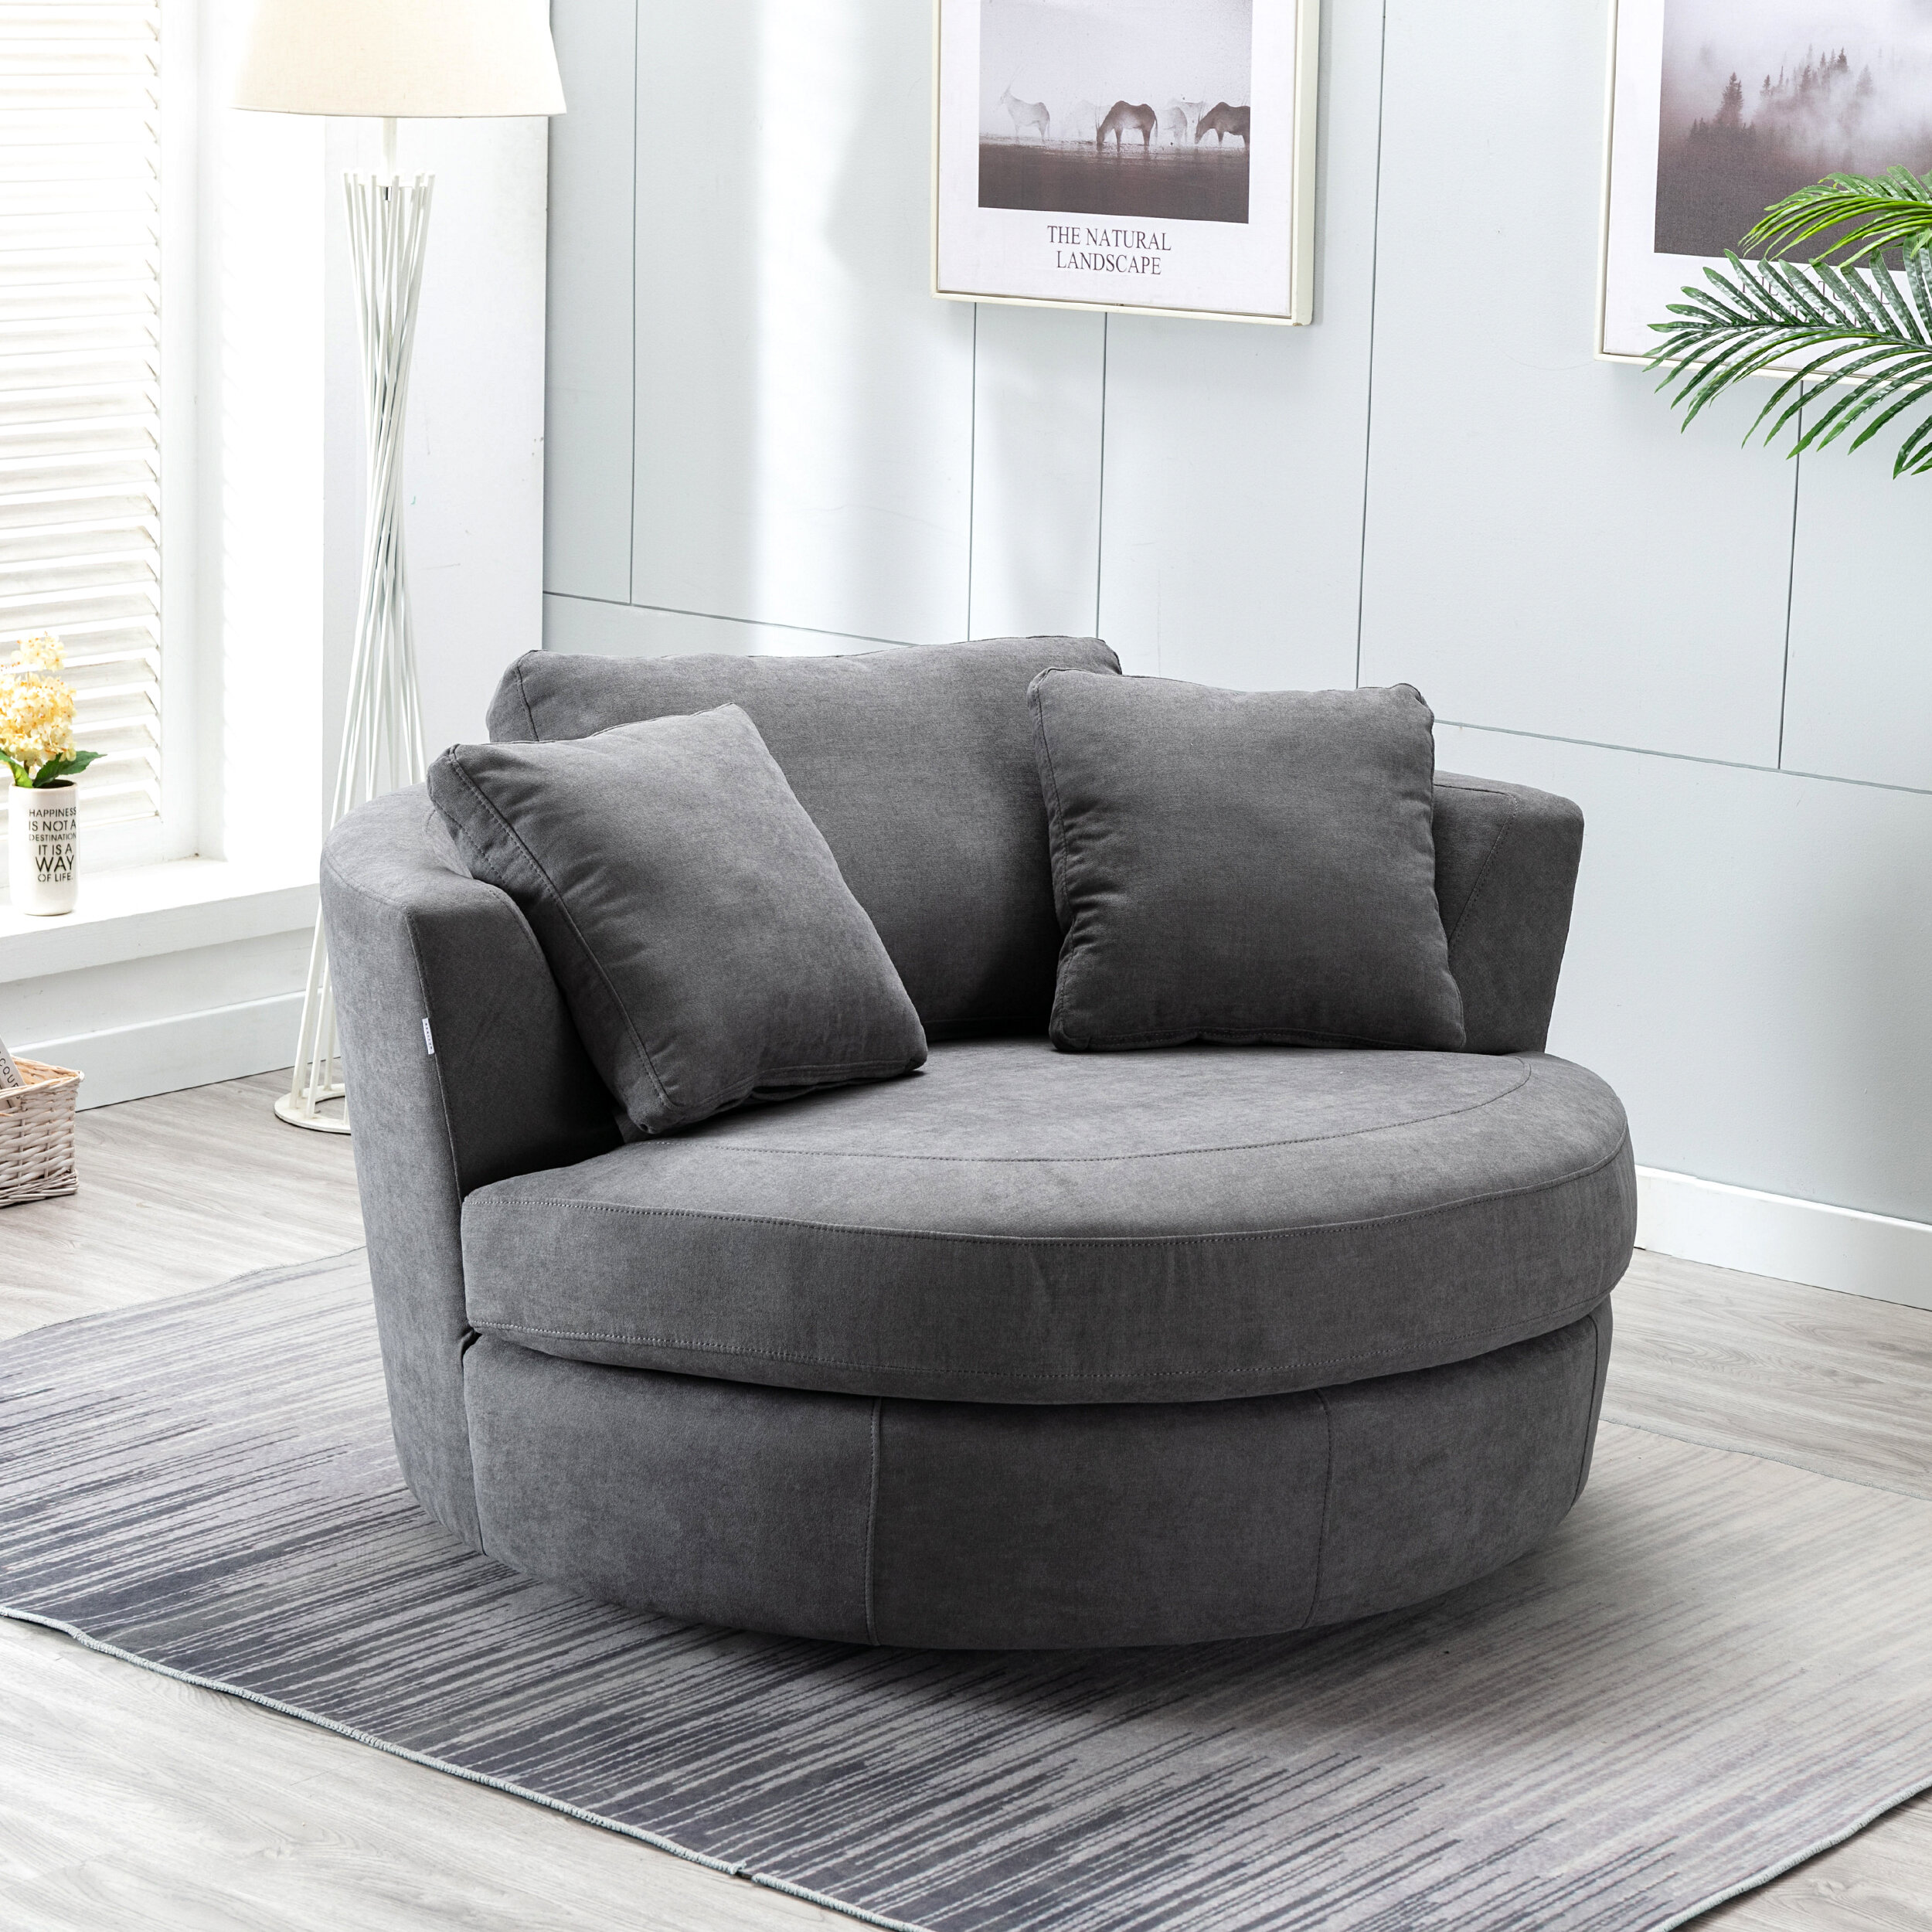 Latitude Run® Minorca Elegant Round Swivel Barrel Chair & Reviews